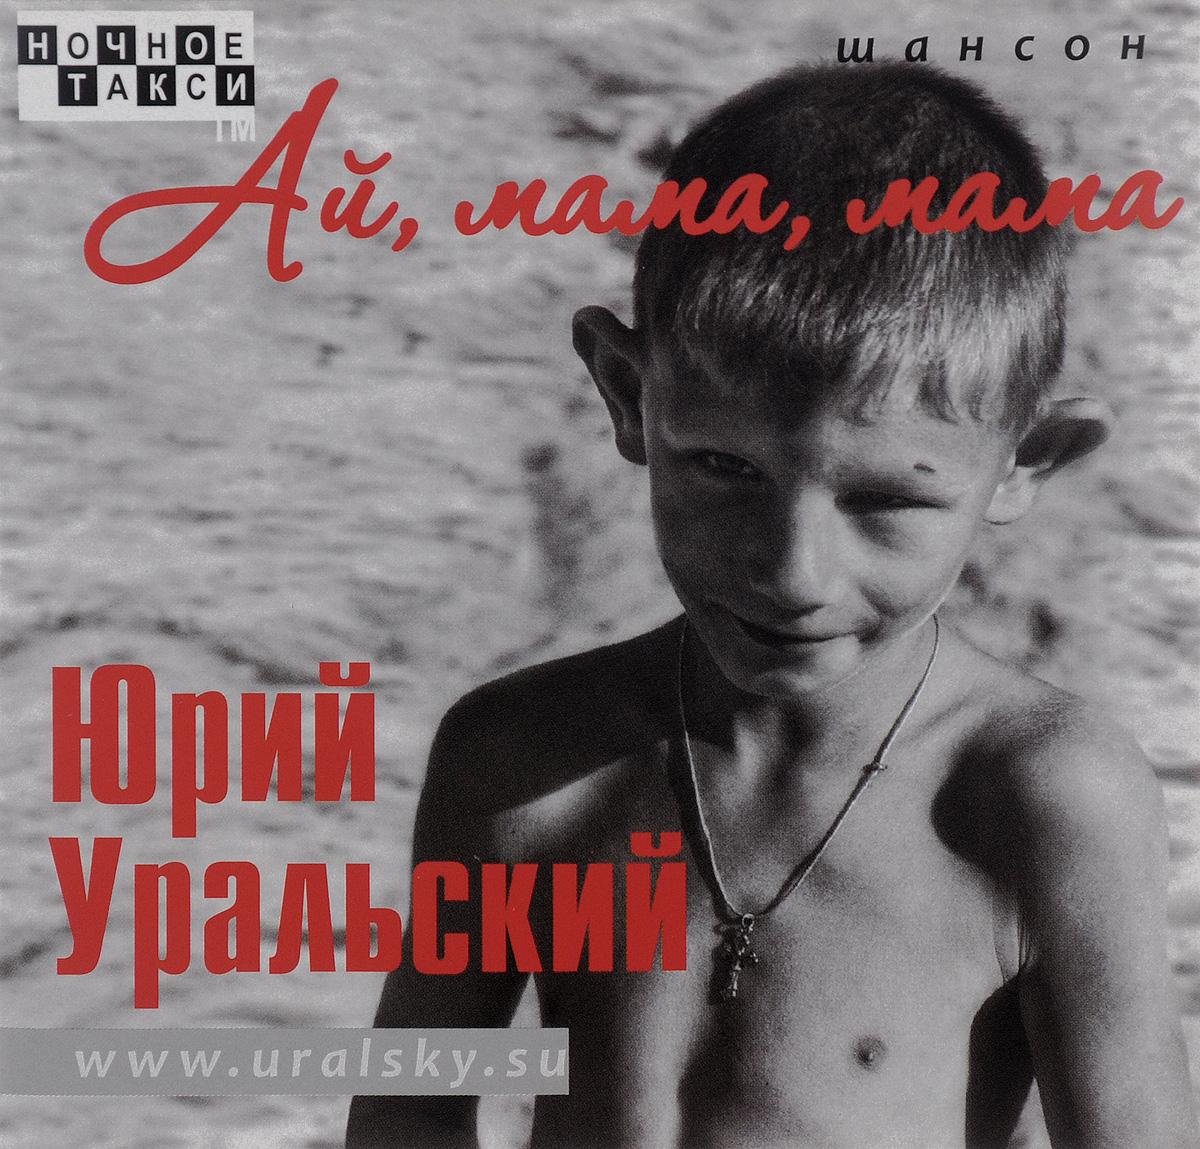 Zakazat.ru: Юрий Уральский. Ай, мама, мама